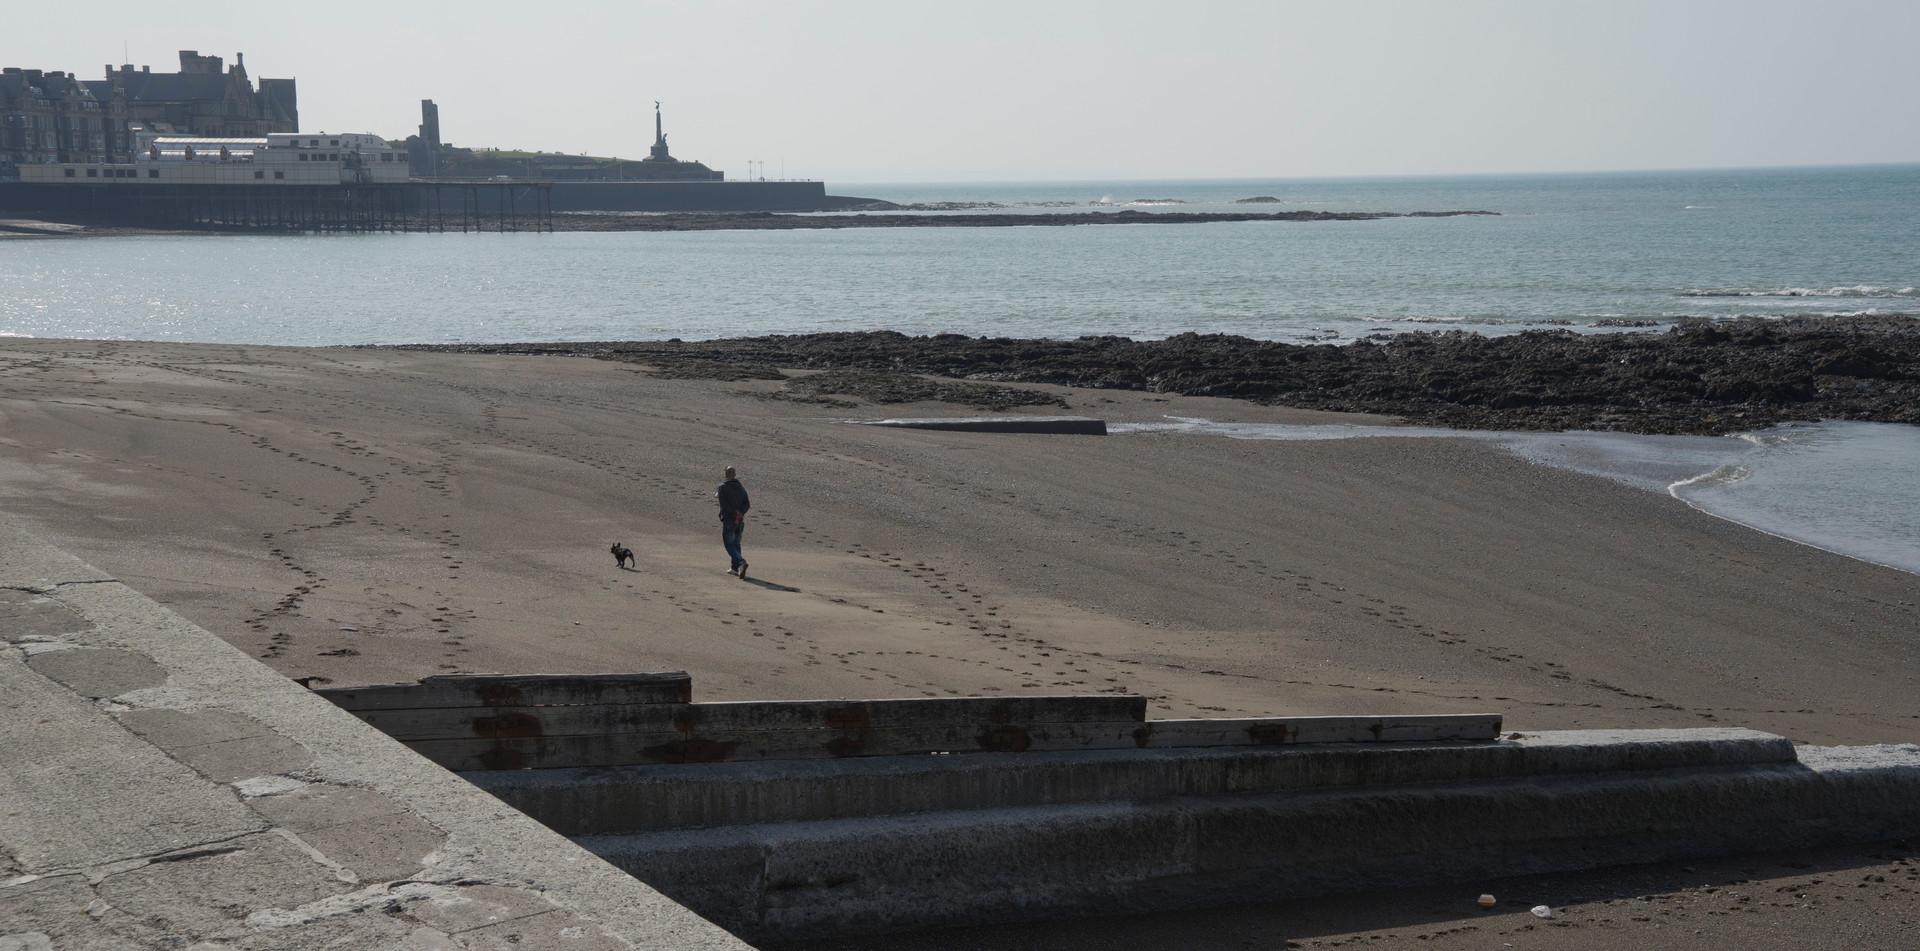 Walking a dog in a deserted beach